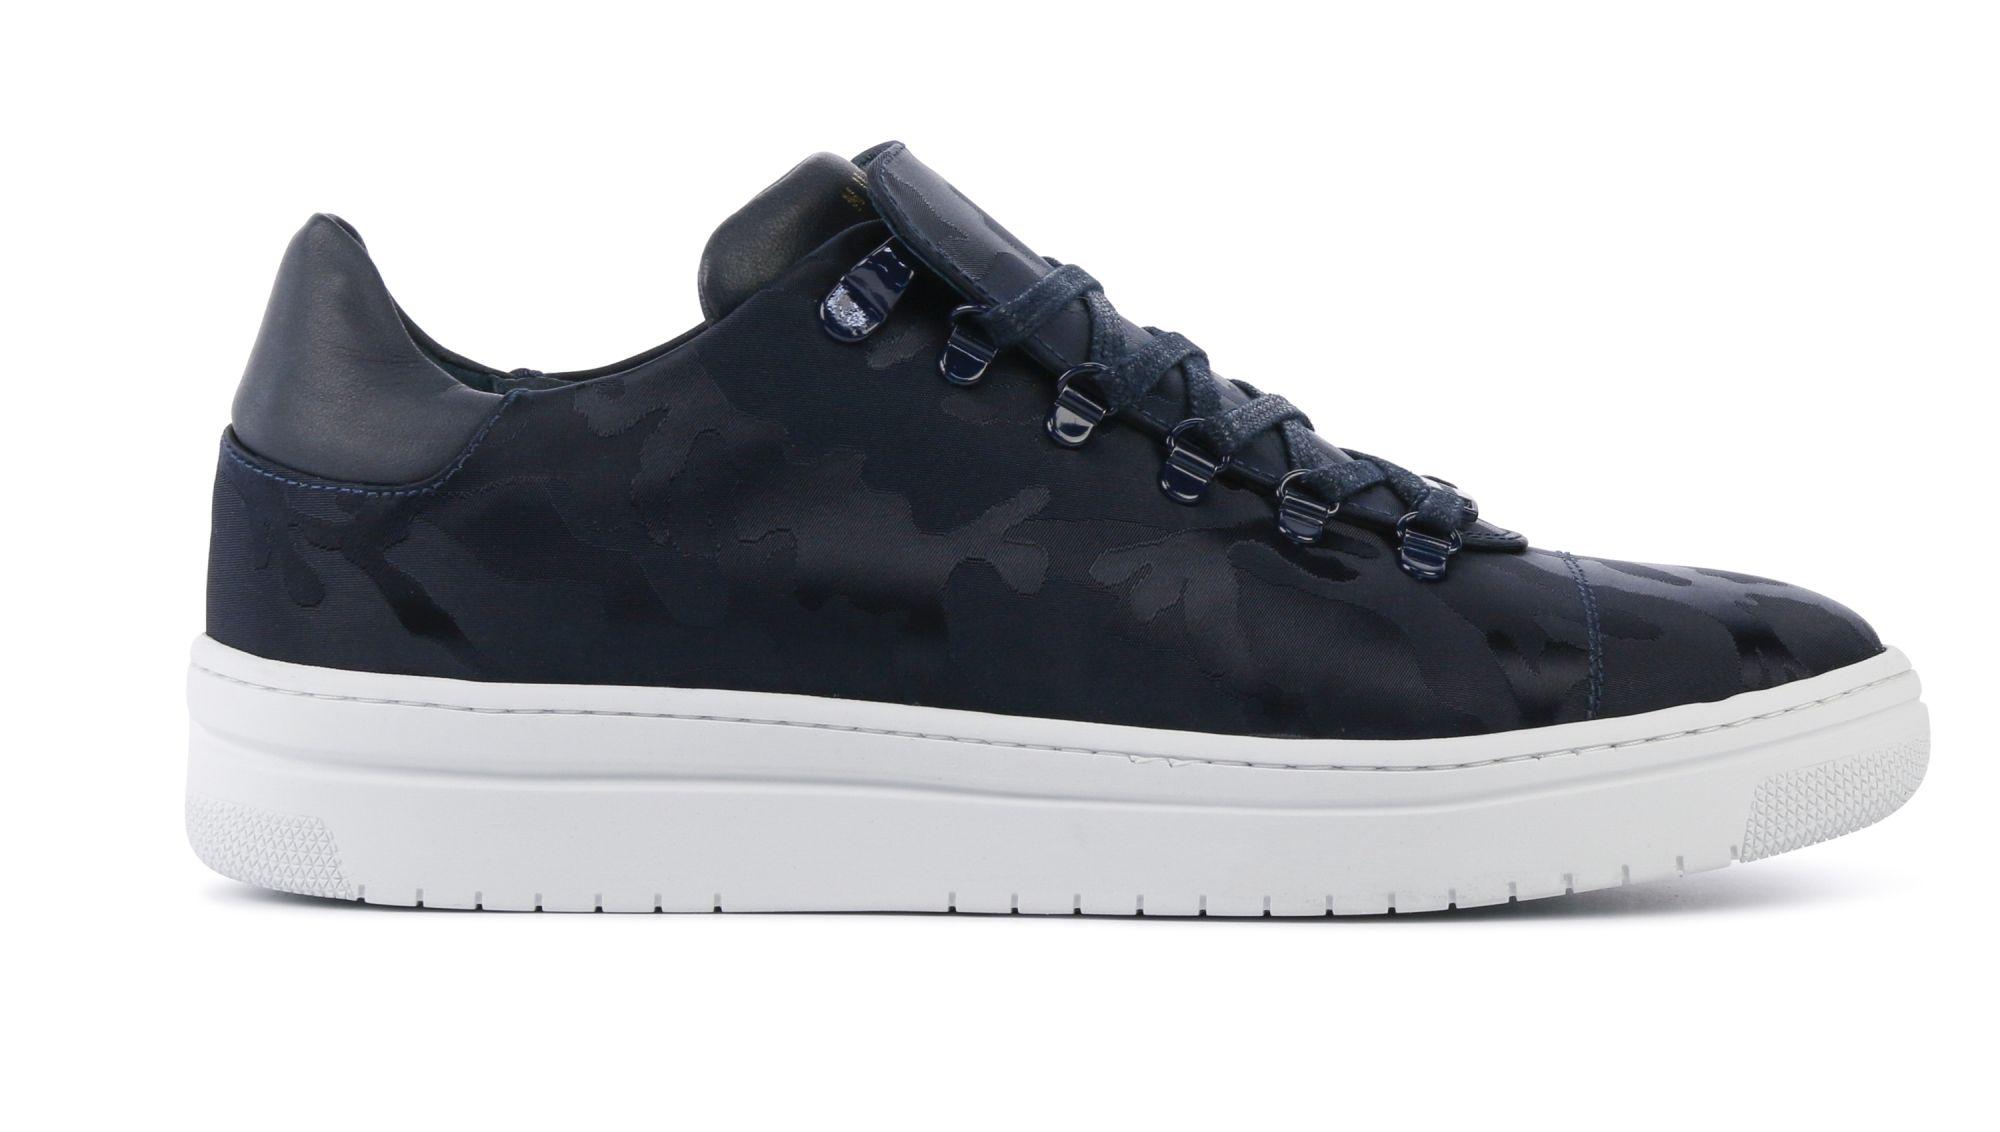 Sneakers Dames (Blauw) mode-stijl lLZUjeM8M